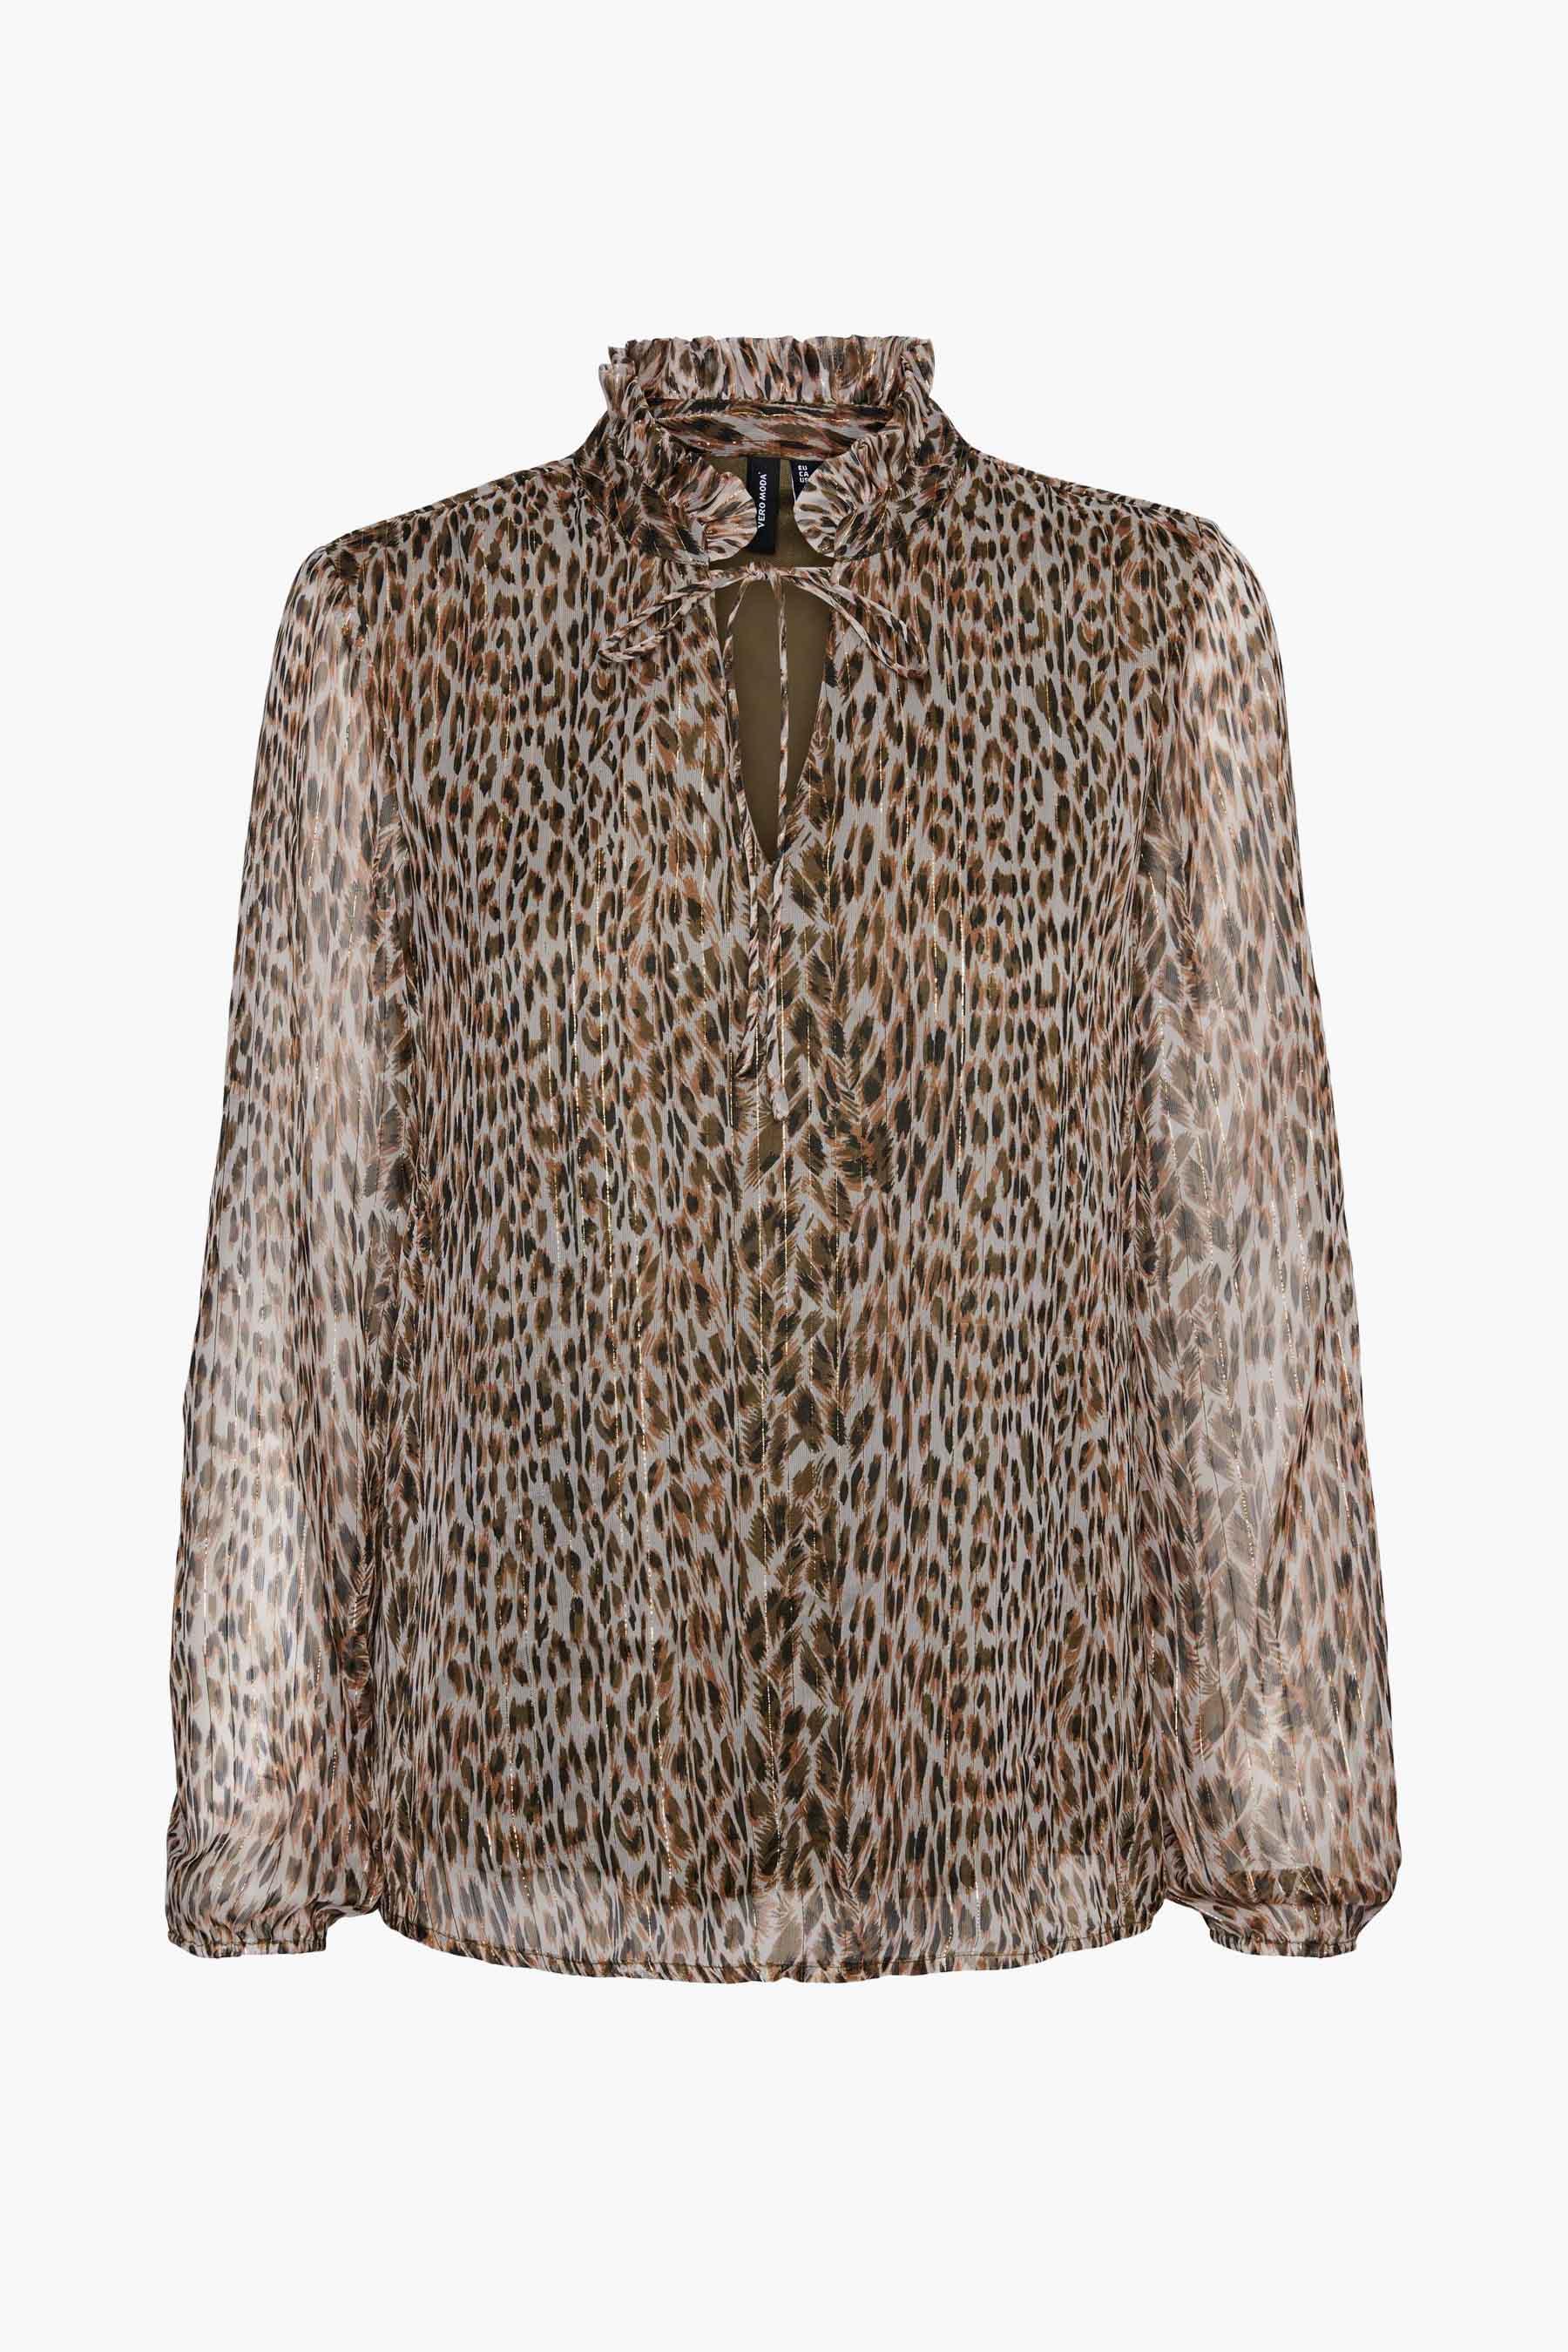 Vero Moda® Blouse lange mouwen, Beige, Dames, Maat: M/S/XL/XS